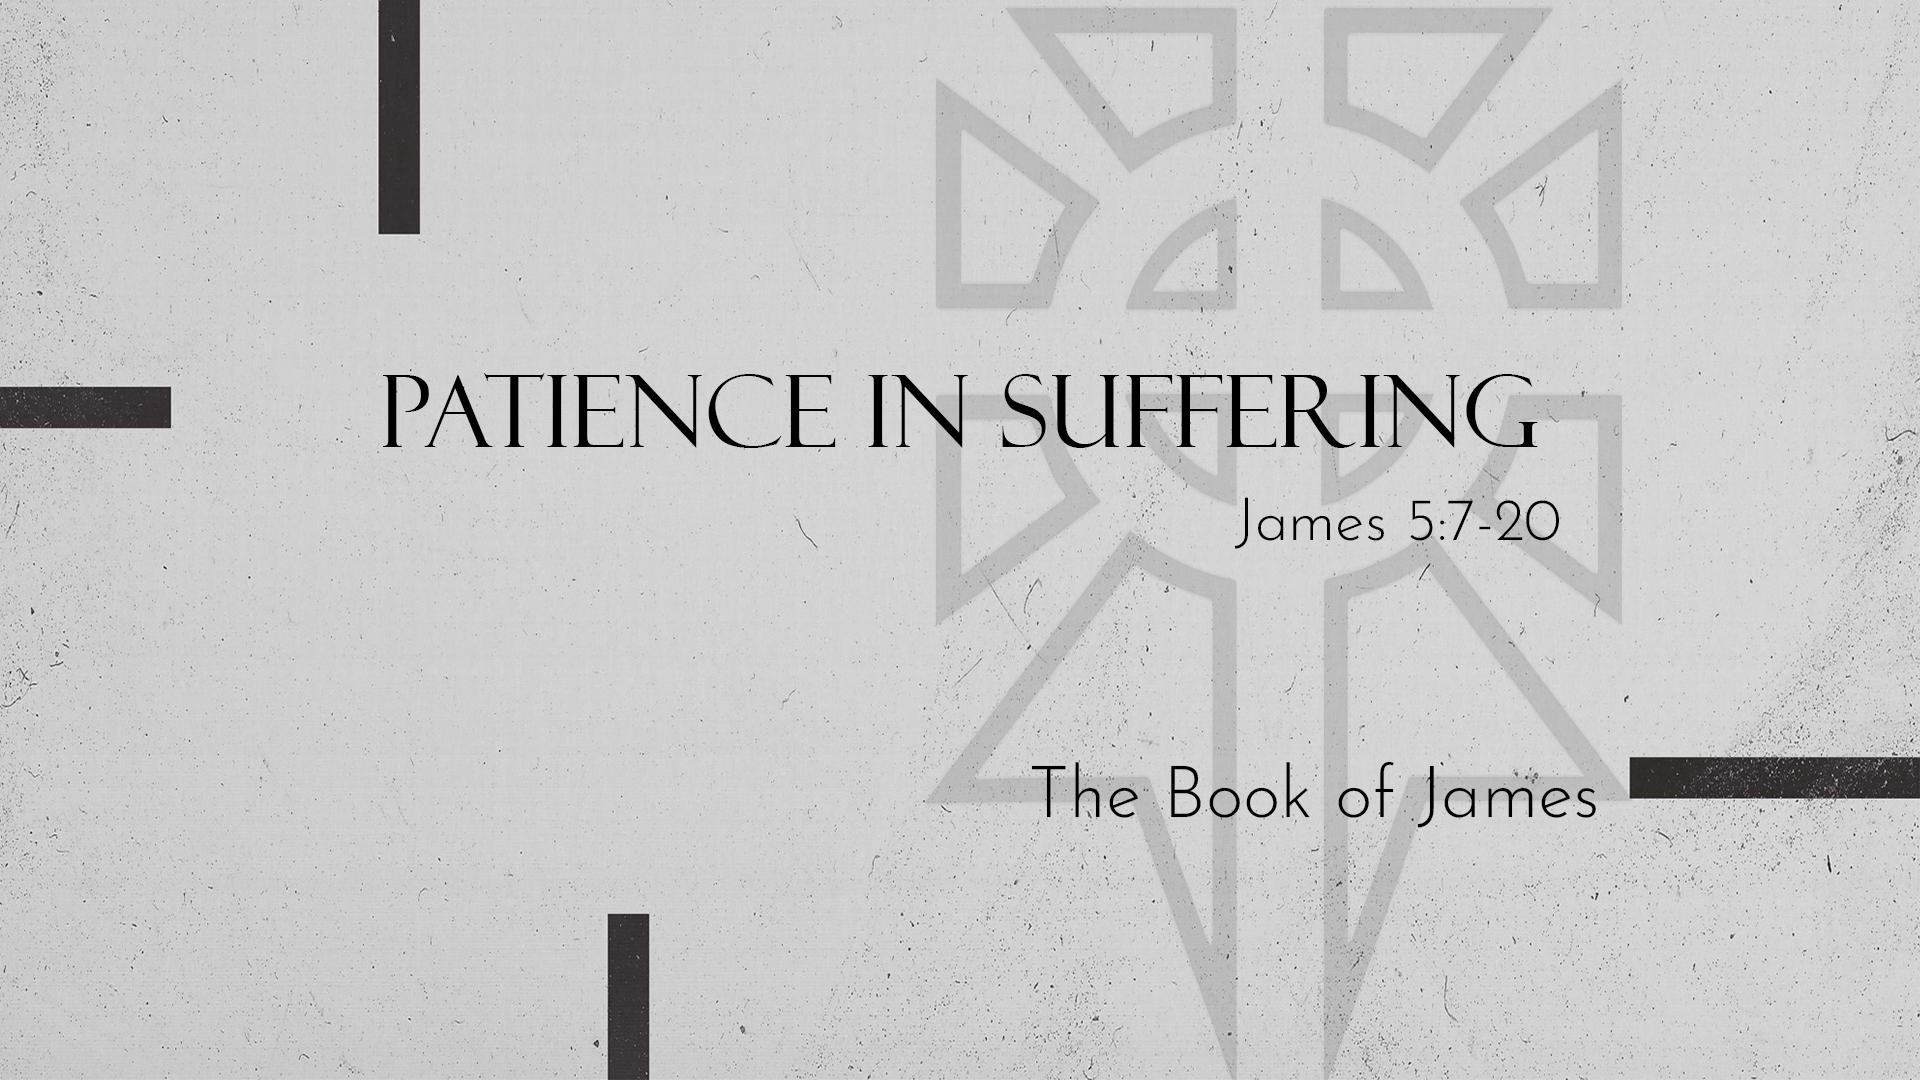 Patience in Suffering